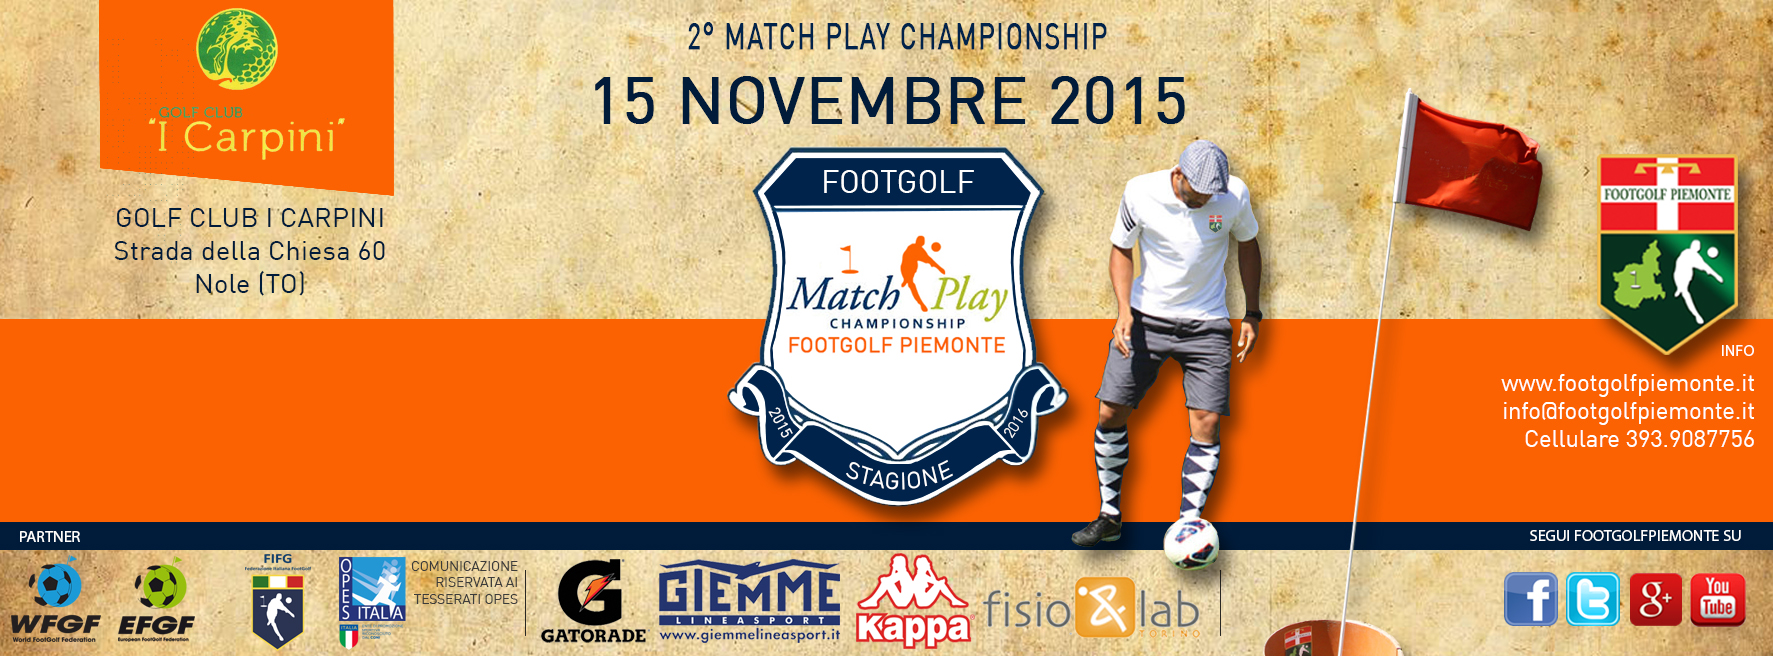 Locandina 2 tappa Match Play Footgolf Piemonte 2016 Nole TO domenica 15 novembre 2015